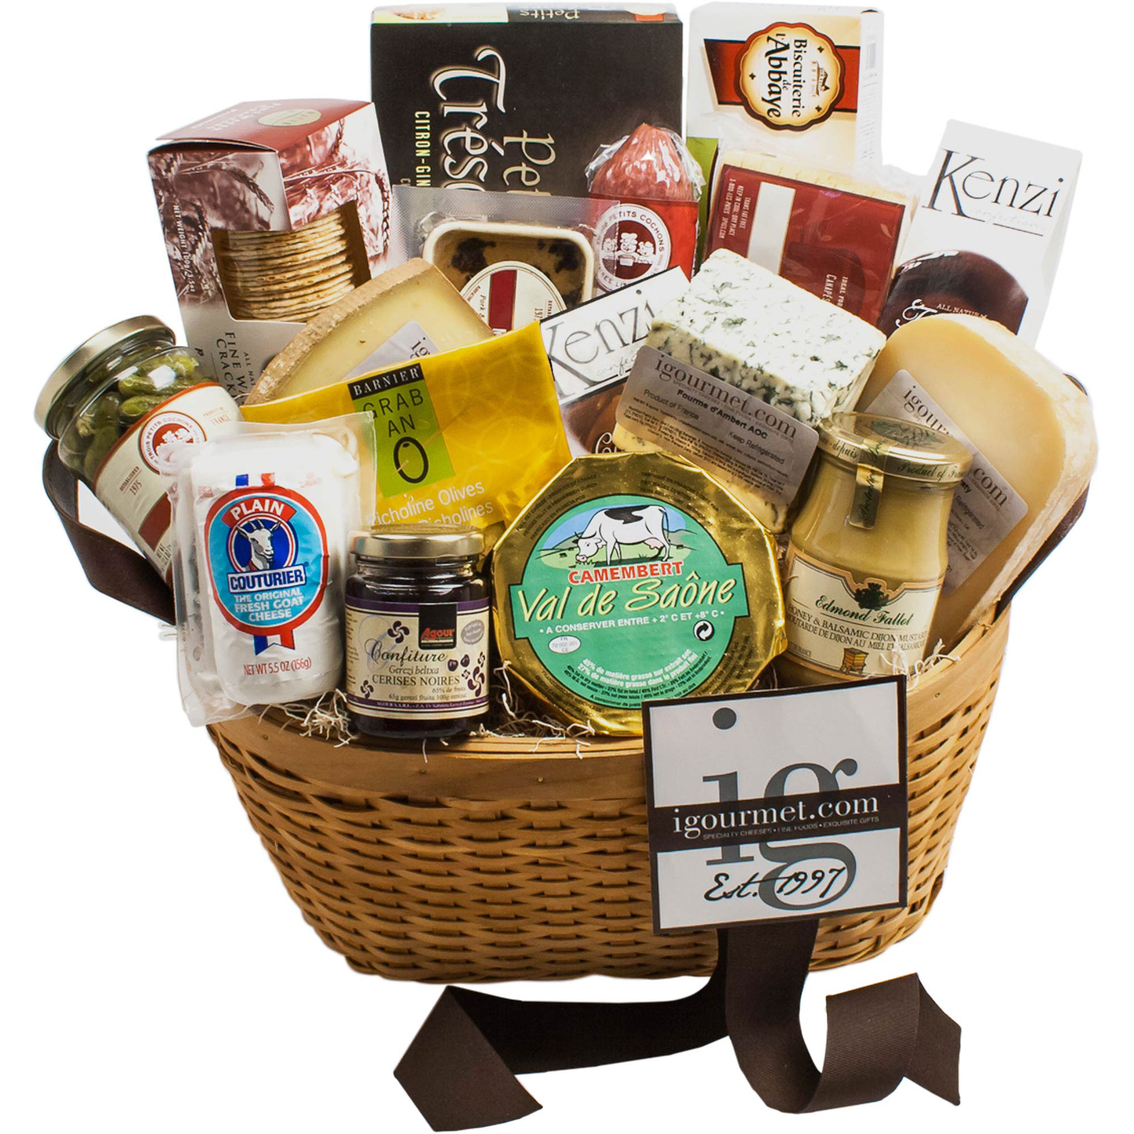 the gourmet market french premier gift basket gourmet food baskets gifts food shop the. Black Bedroom Furniture Sets. Home Design Ideas